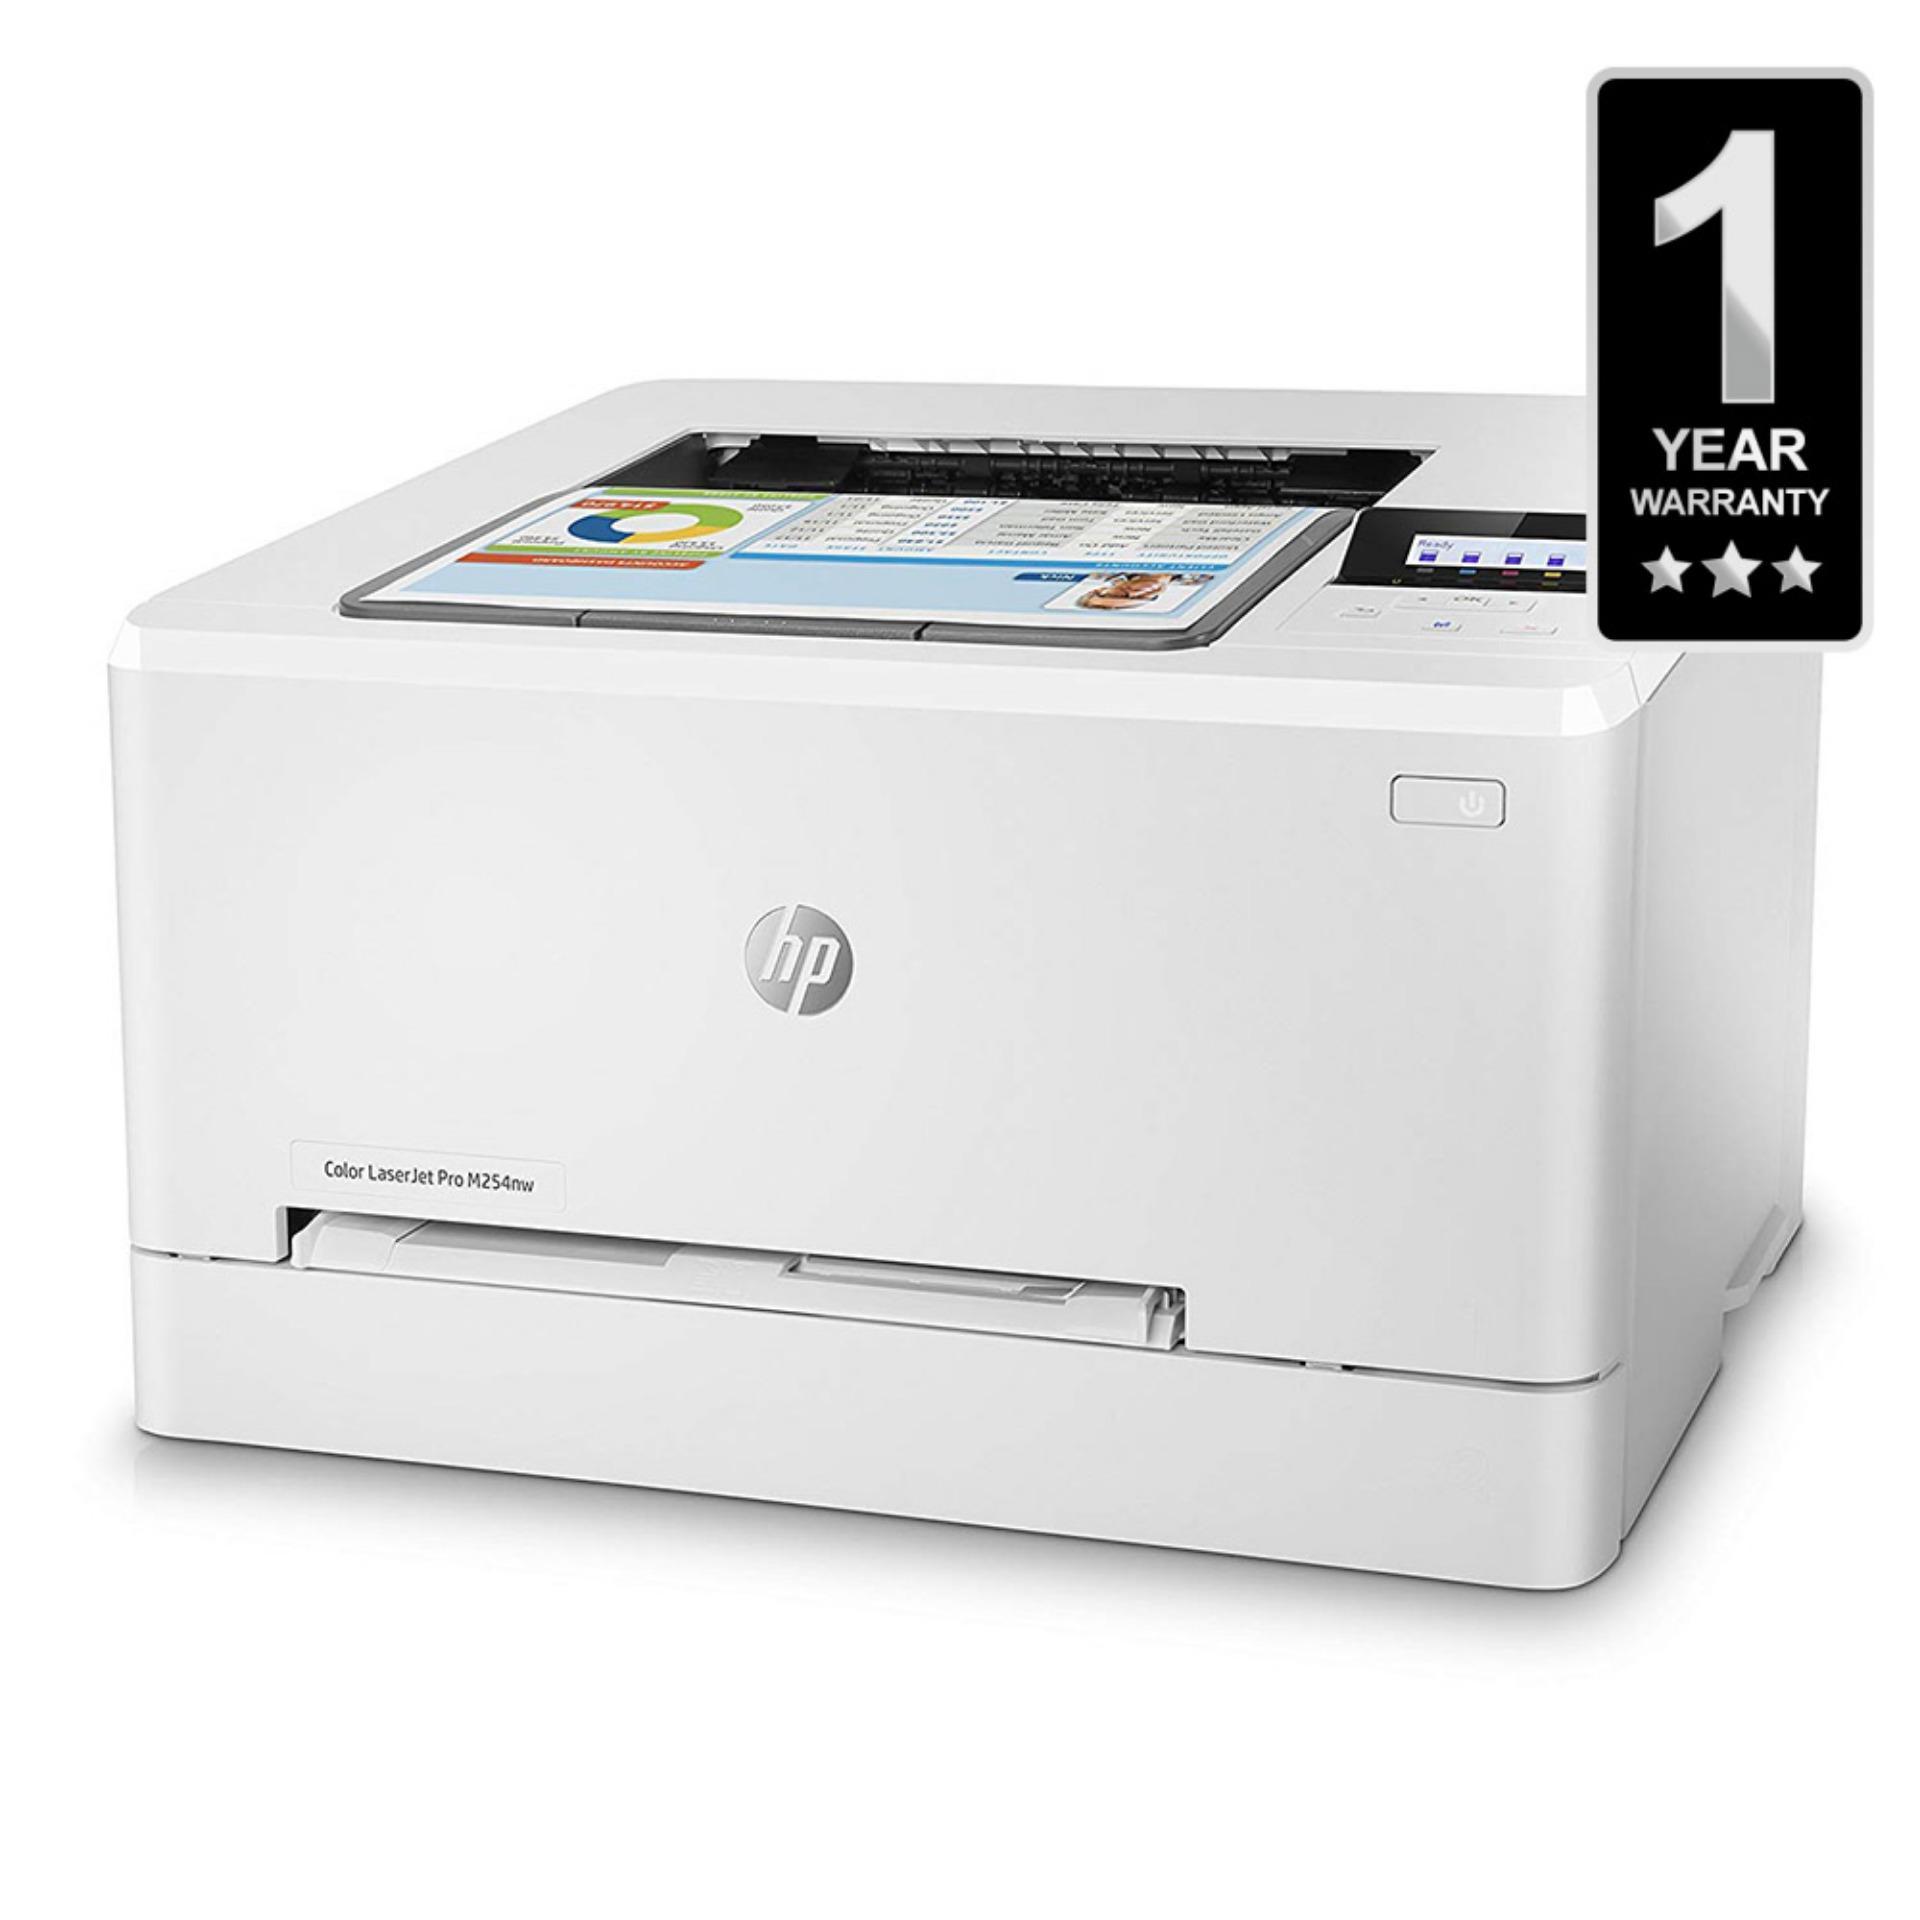 HP Color Laserjet Pro M254Nw Printer - White